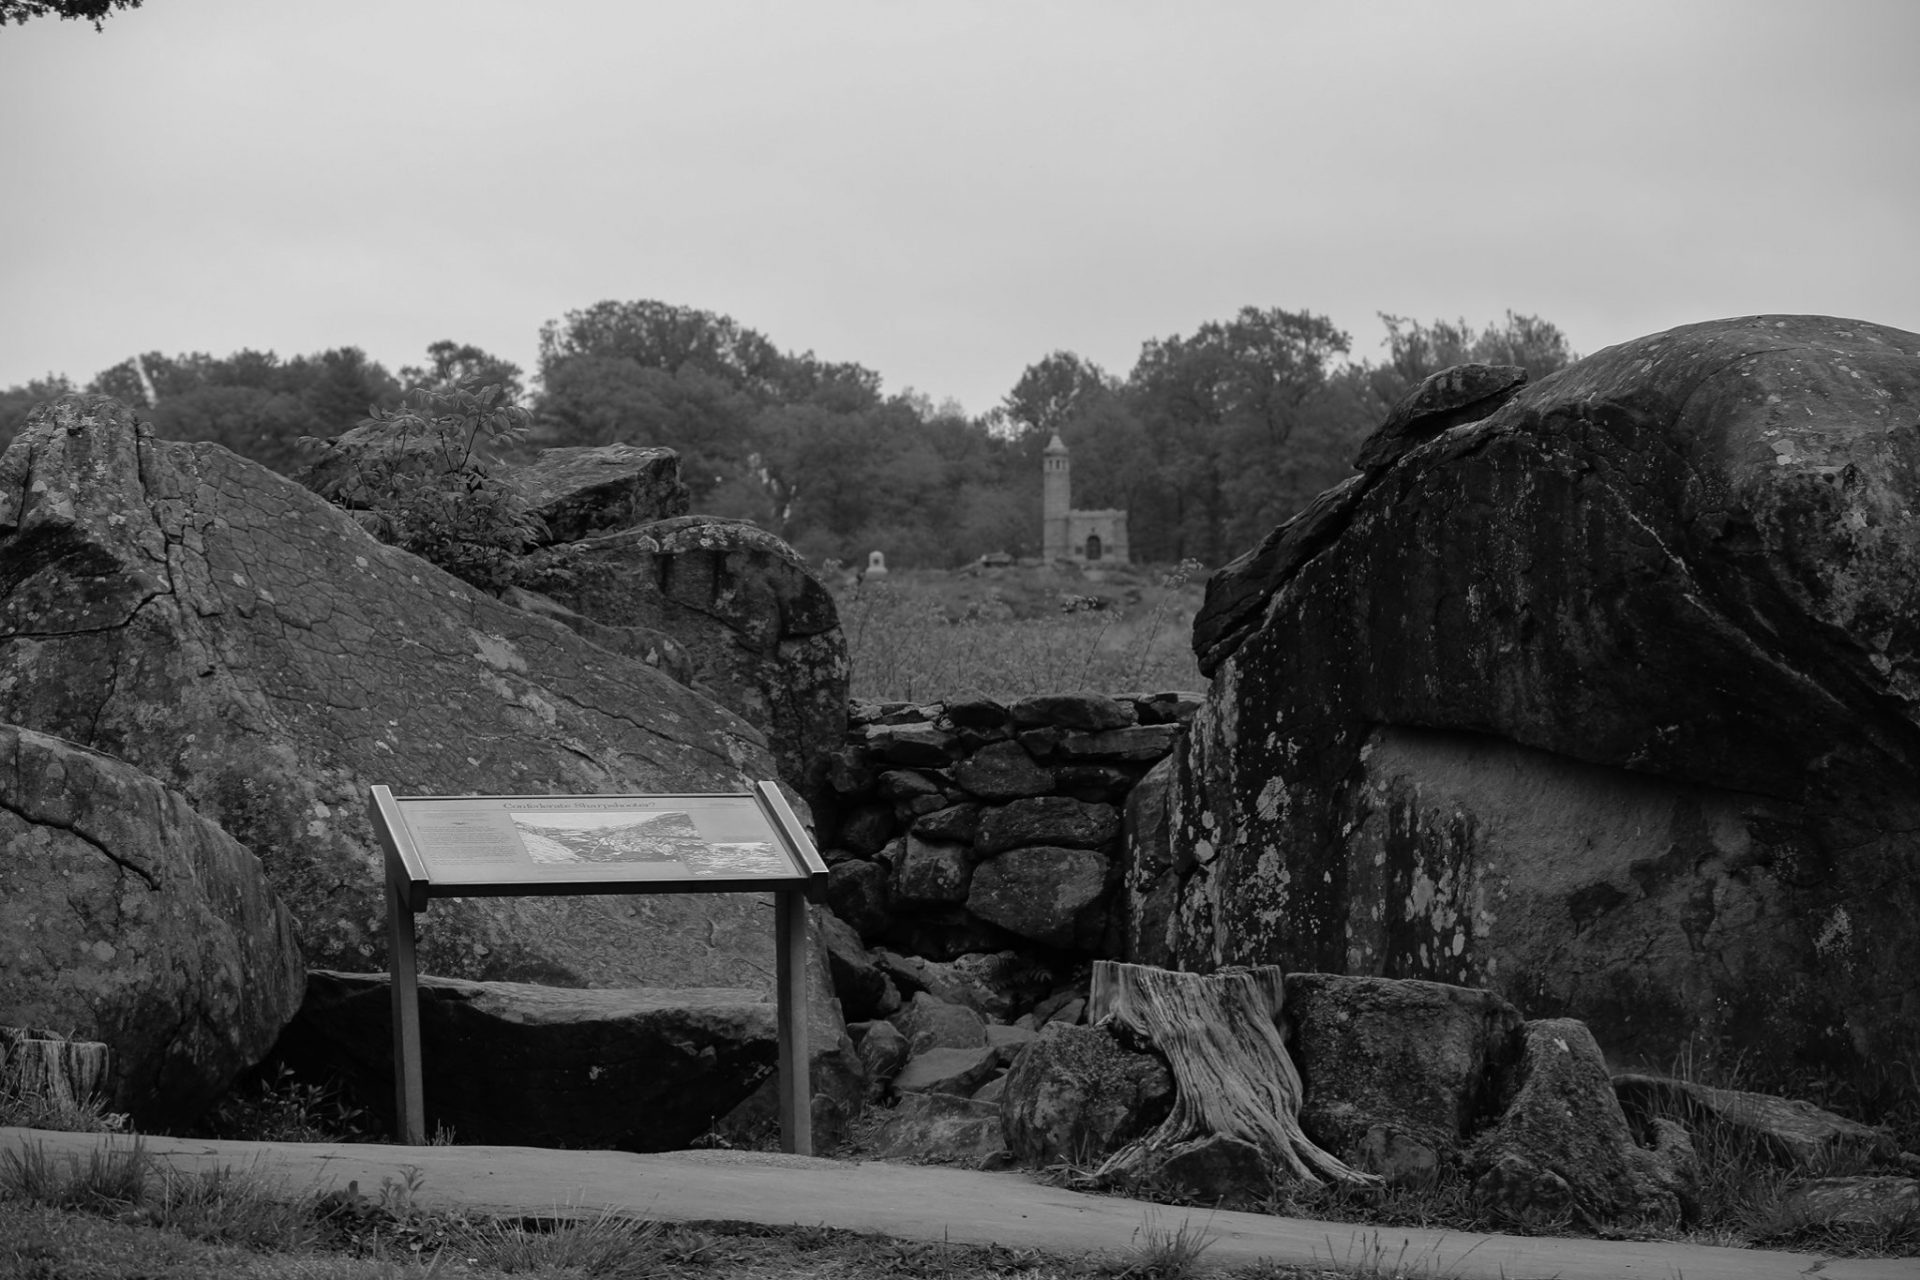 Devil's Den at the Gettysburg National Military Park